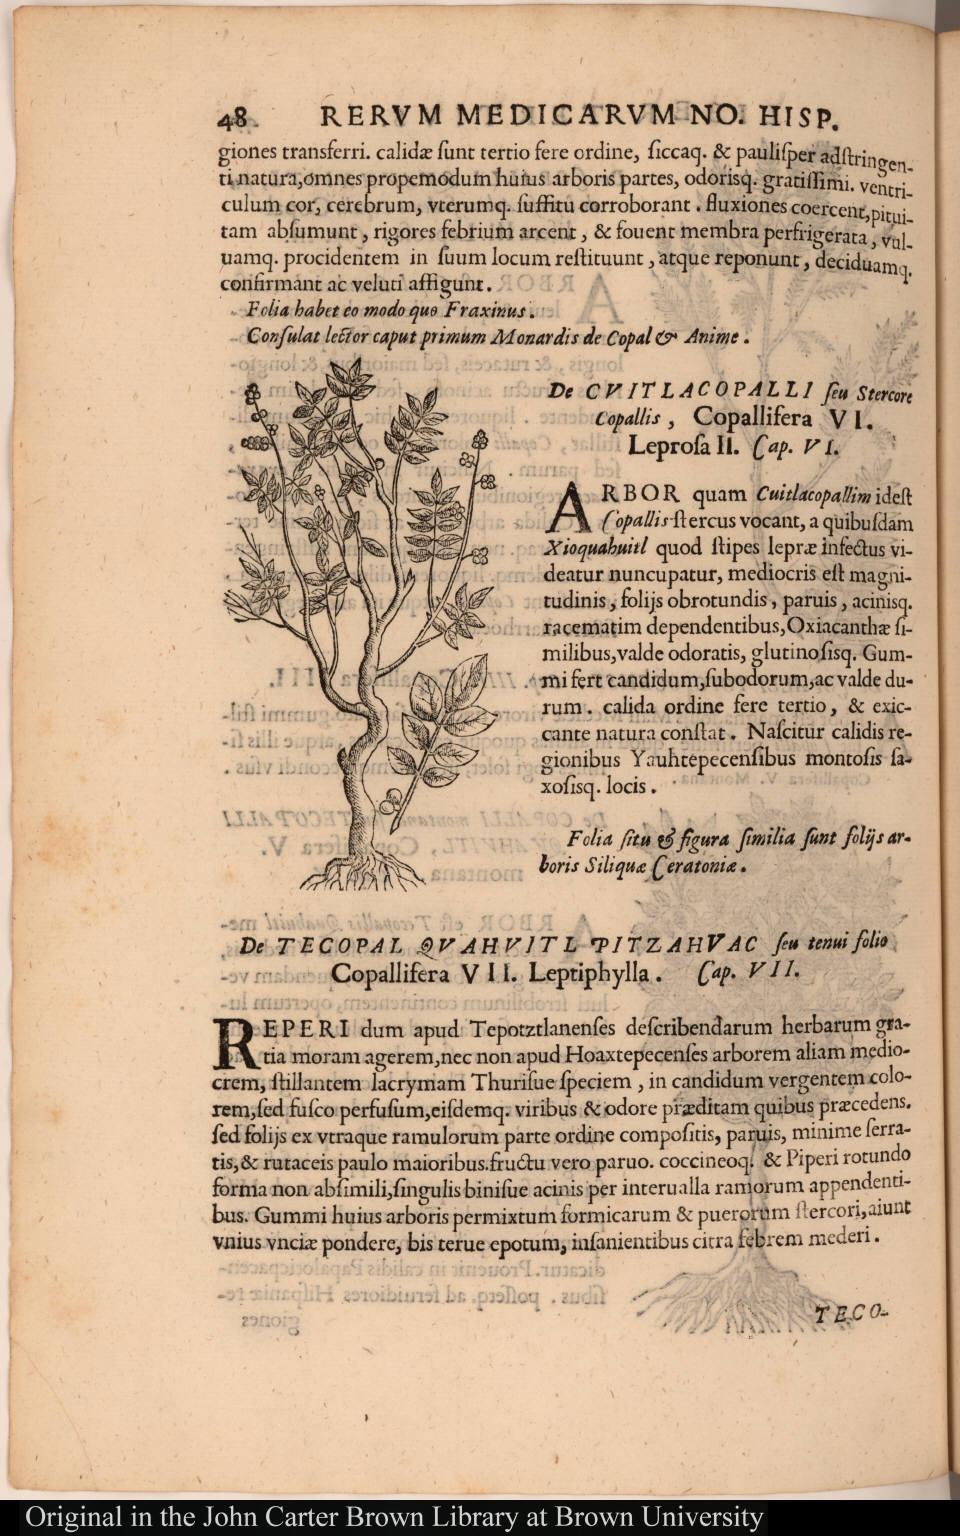 [De Cuitlacopalli seu Stercore Copallis, Copallifera VI. Leprosa II.]